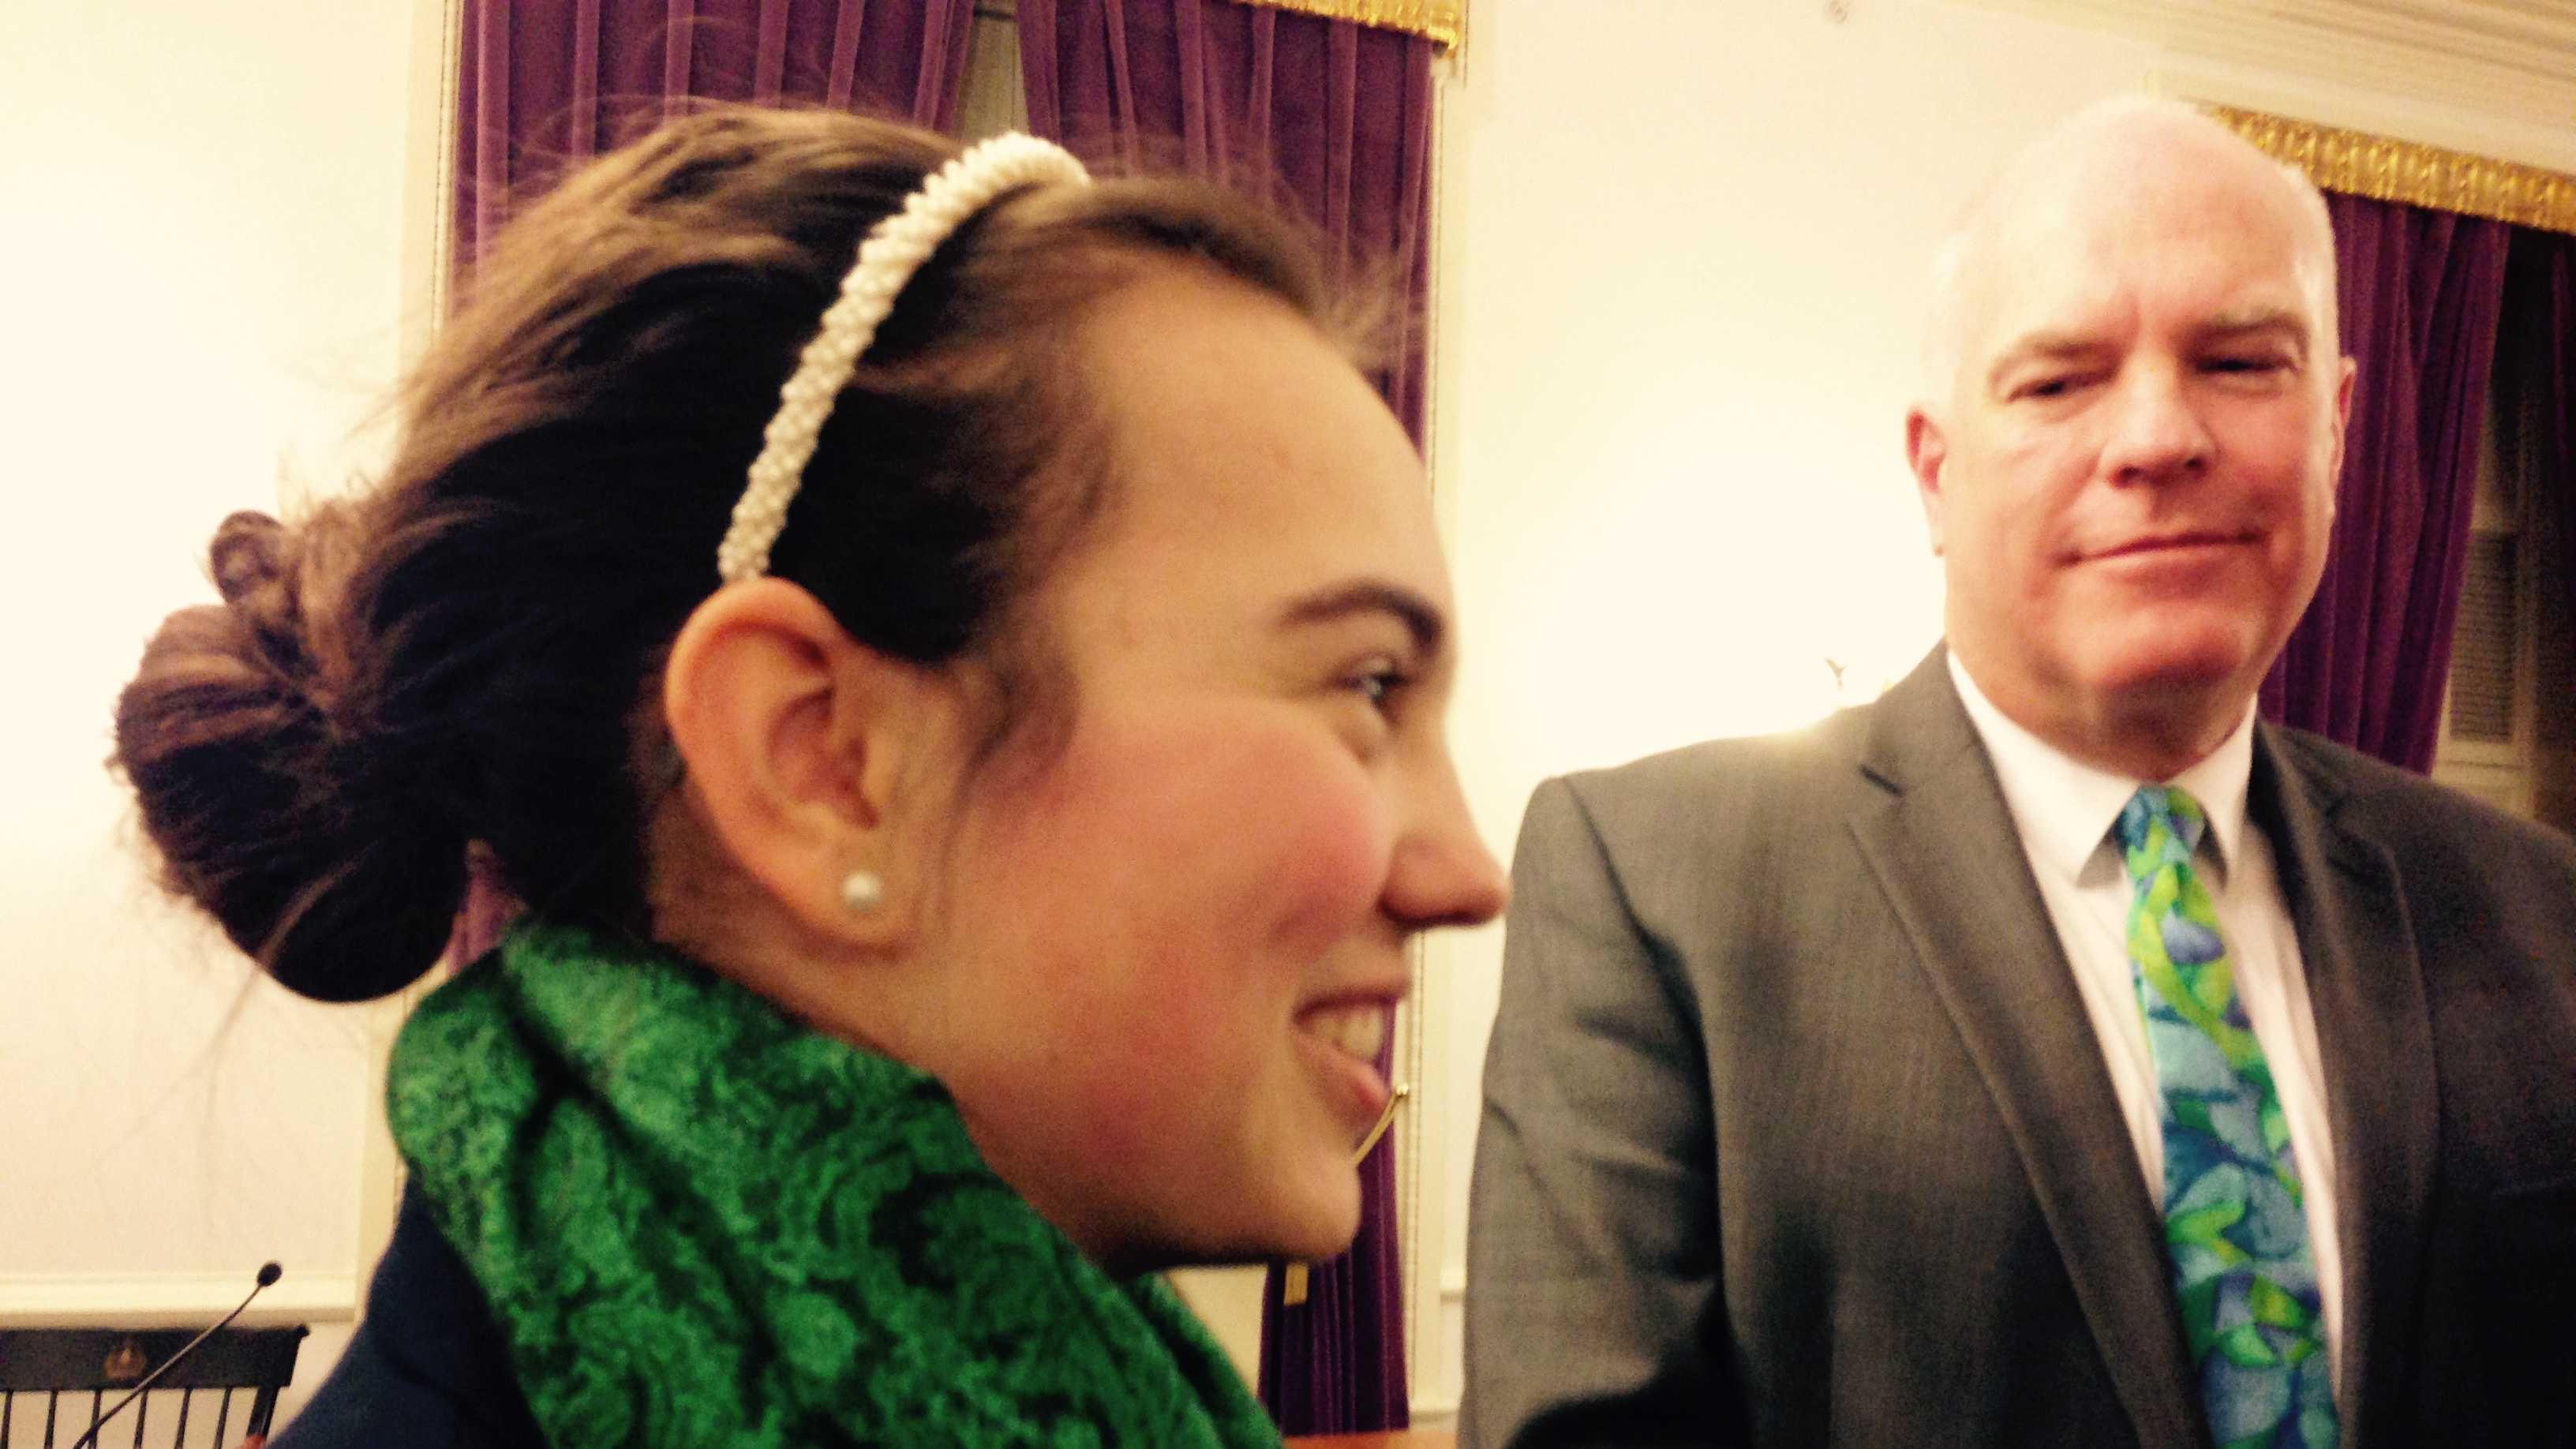 Angela Kubicke, 15, with Sen. Joe Benning at the Statehouse Wednesday.